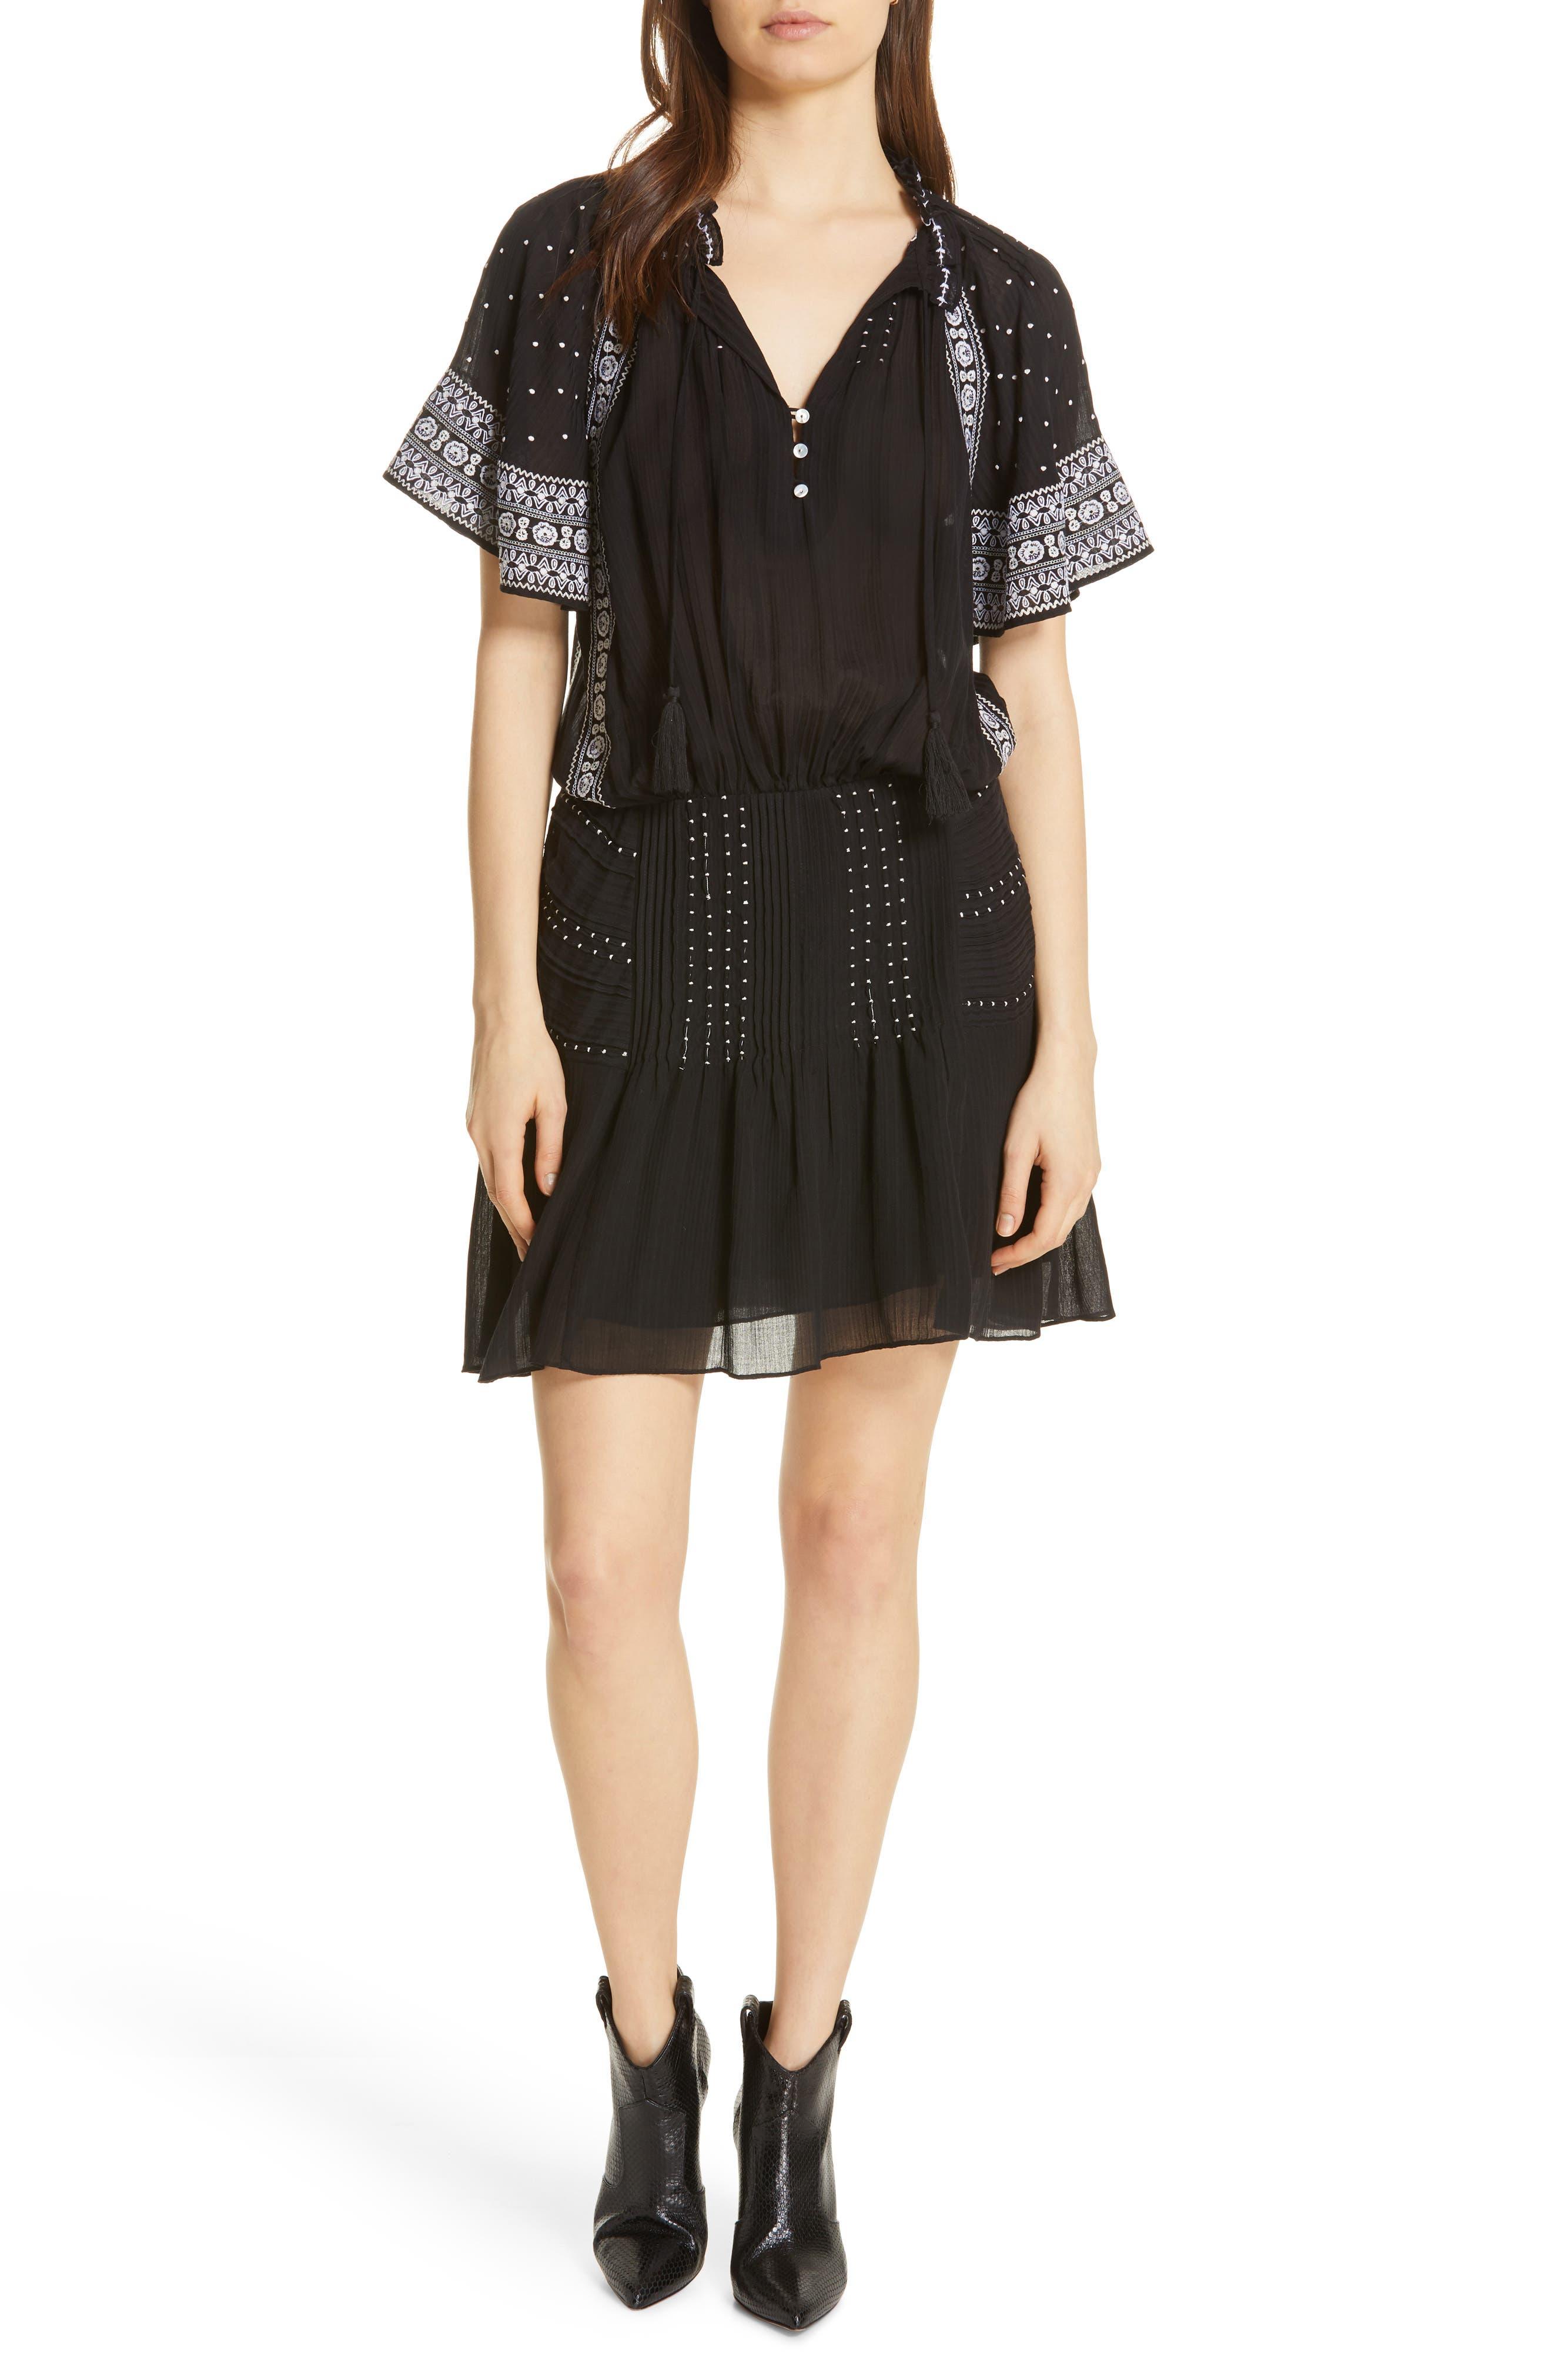 Veronica Beard Minos Embroidered Dress